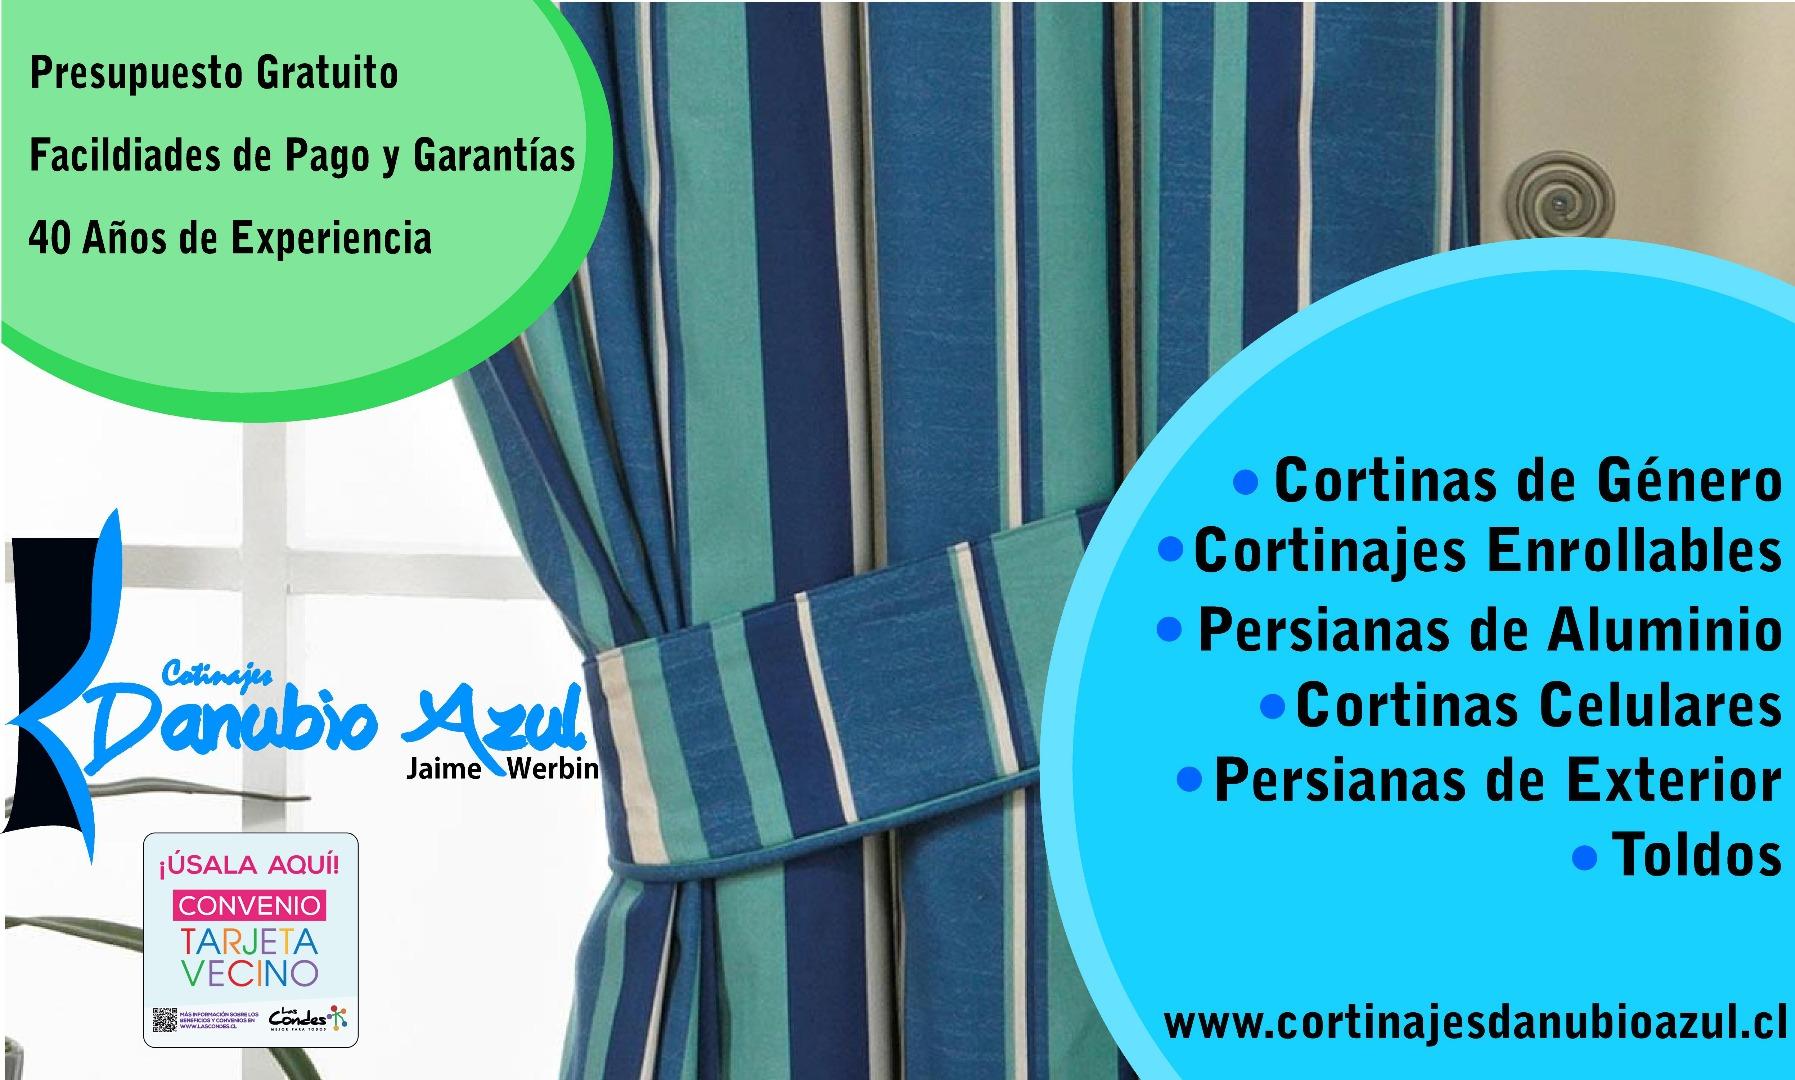 cortinaje flyer